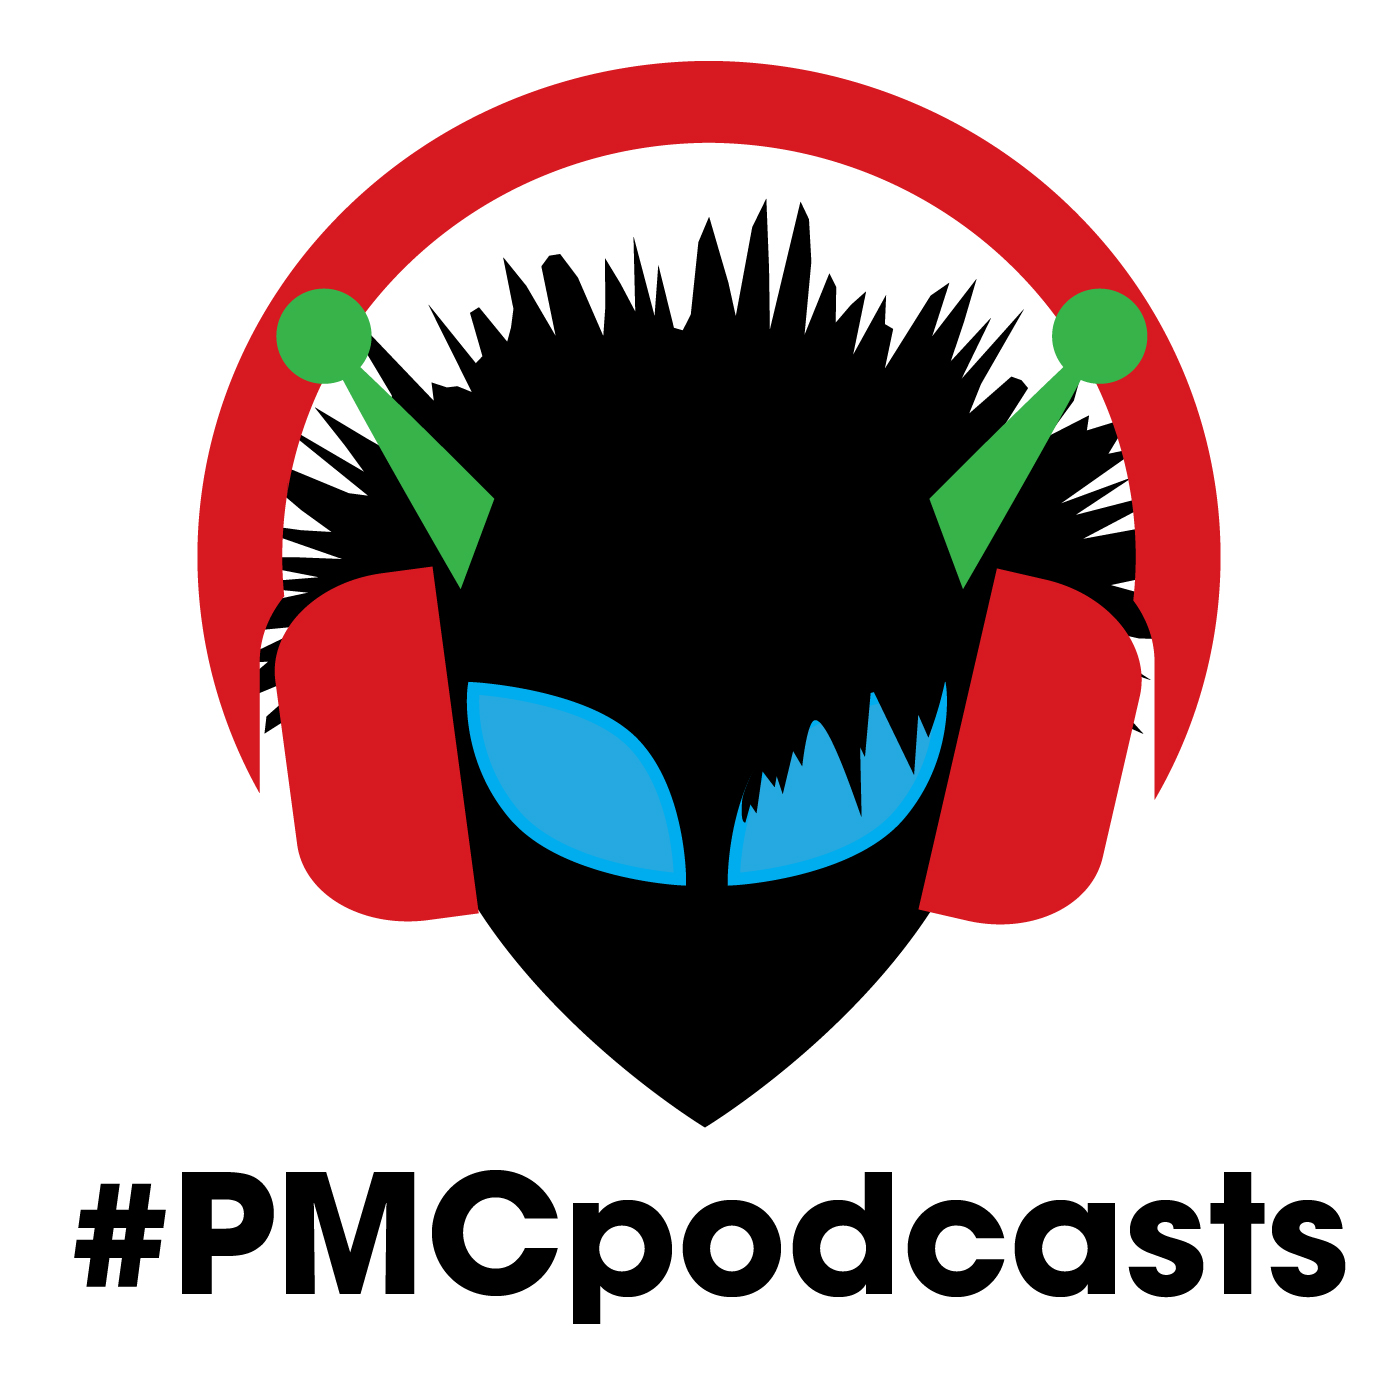 Project Peacock Podcast: Tim Freeman, Kim Tuzzo, PIA, and Melissa Jones, GAA show art